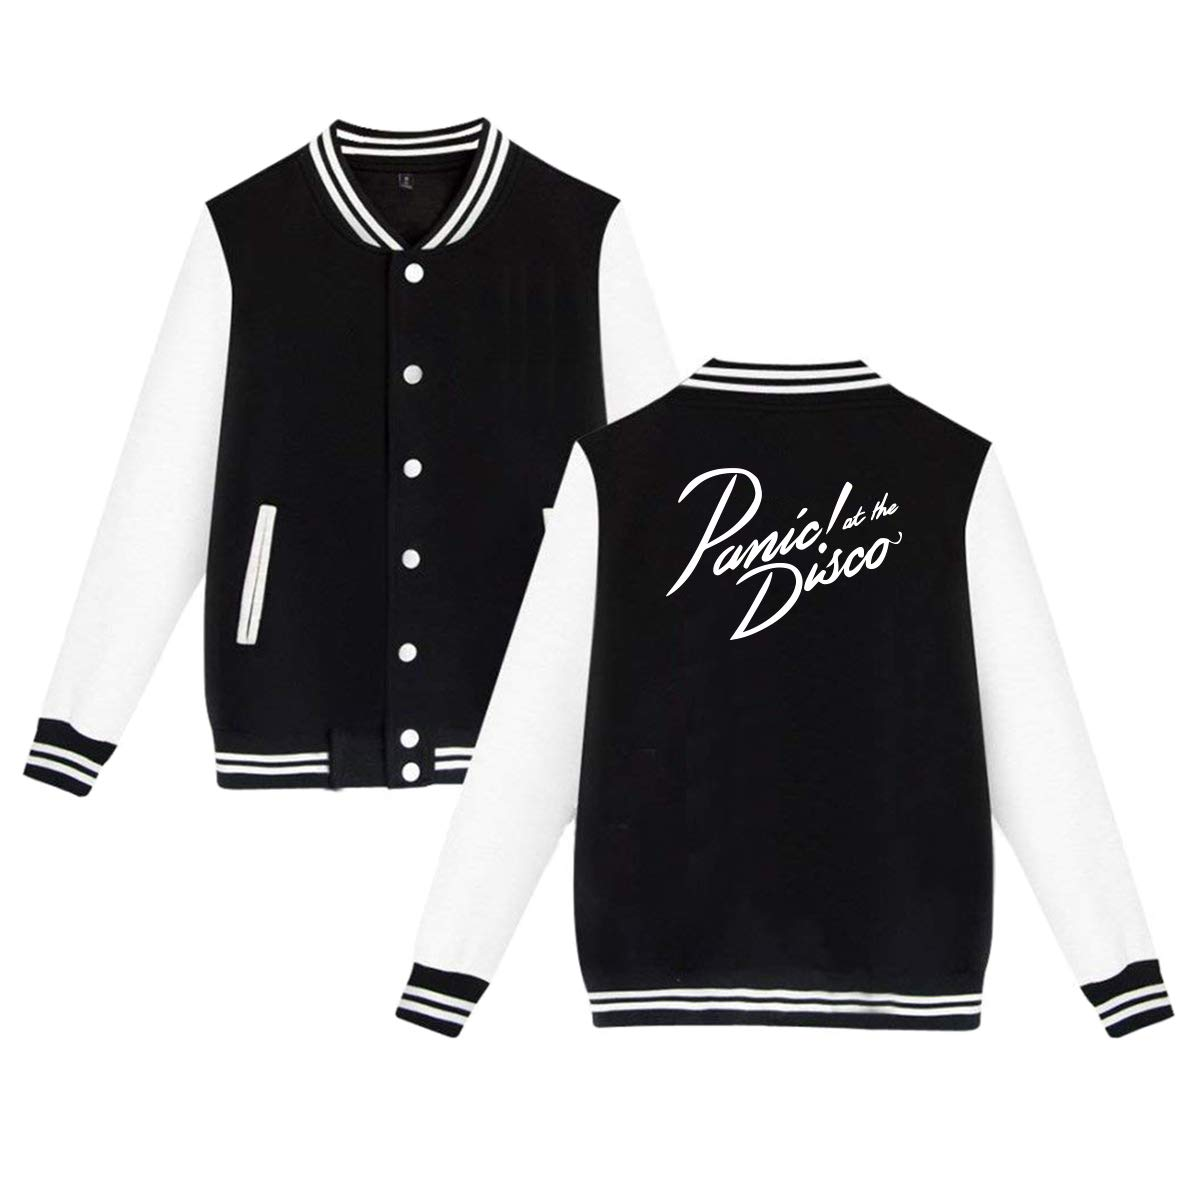 MyLoire Panic at The Disco Unisex Varsity Baseball Jacket Uniform Hoodie Sweatshirt Sweater